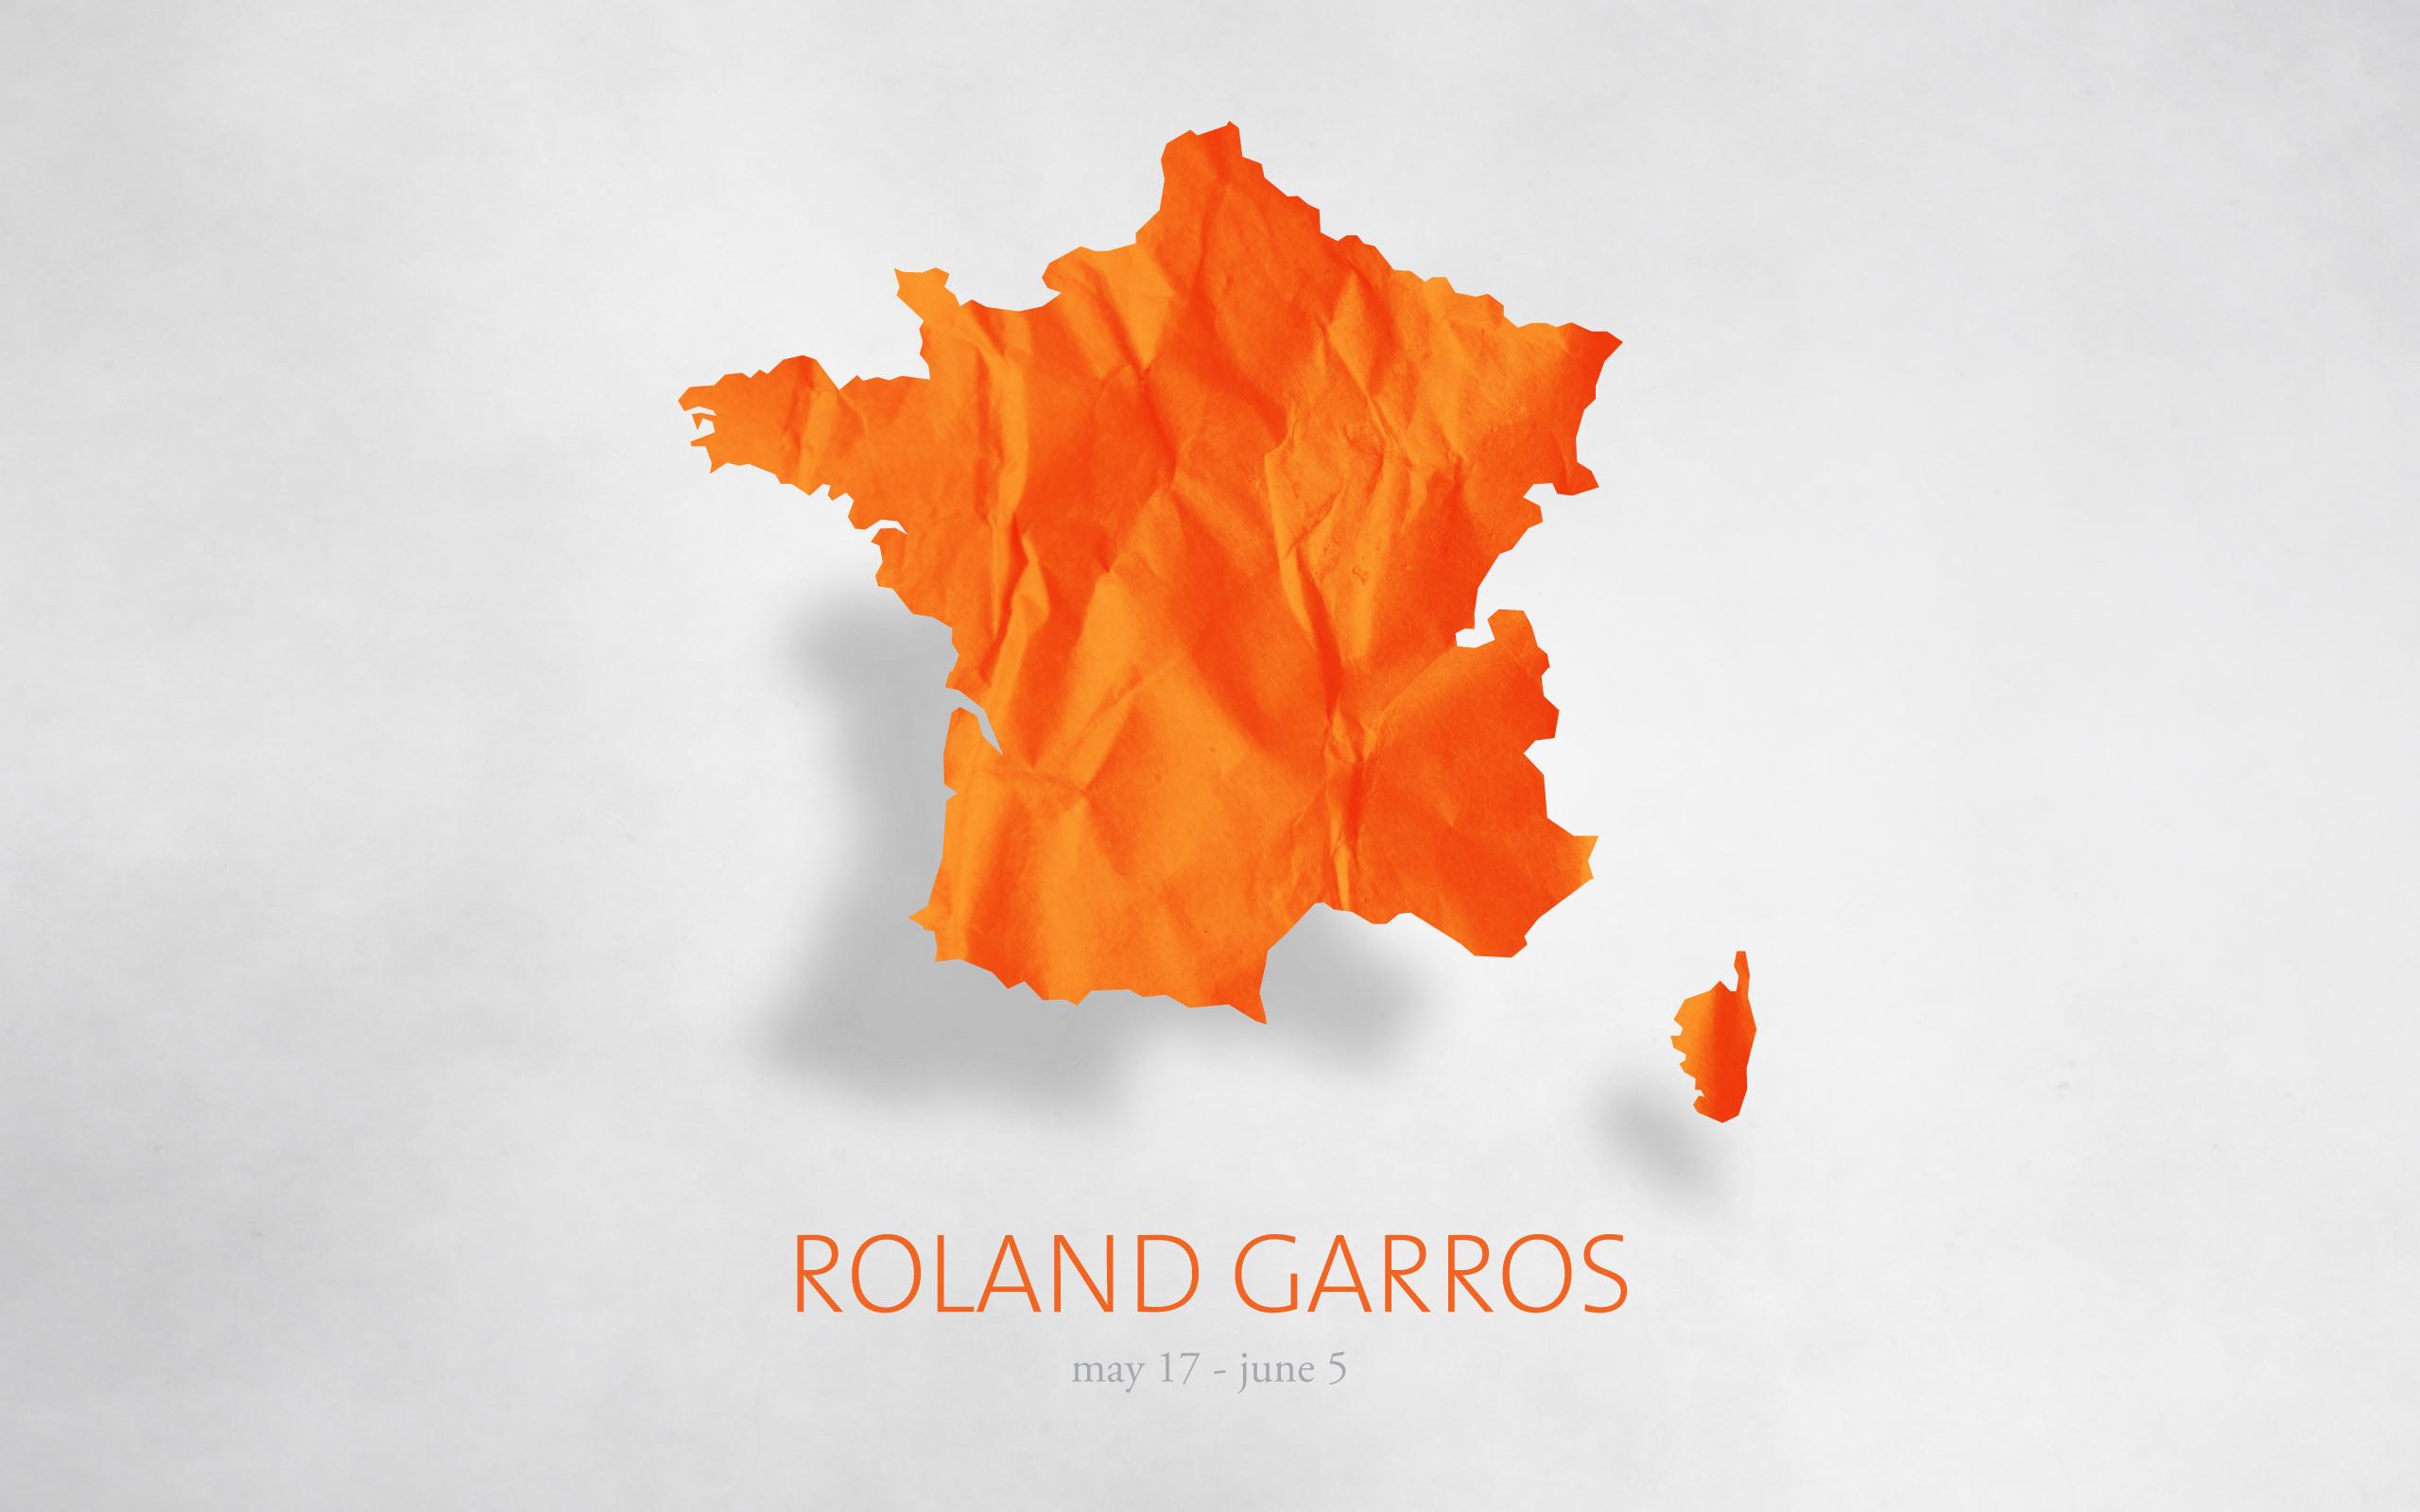 Roland Garros Wallpaper 26